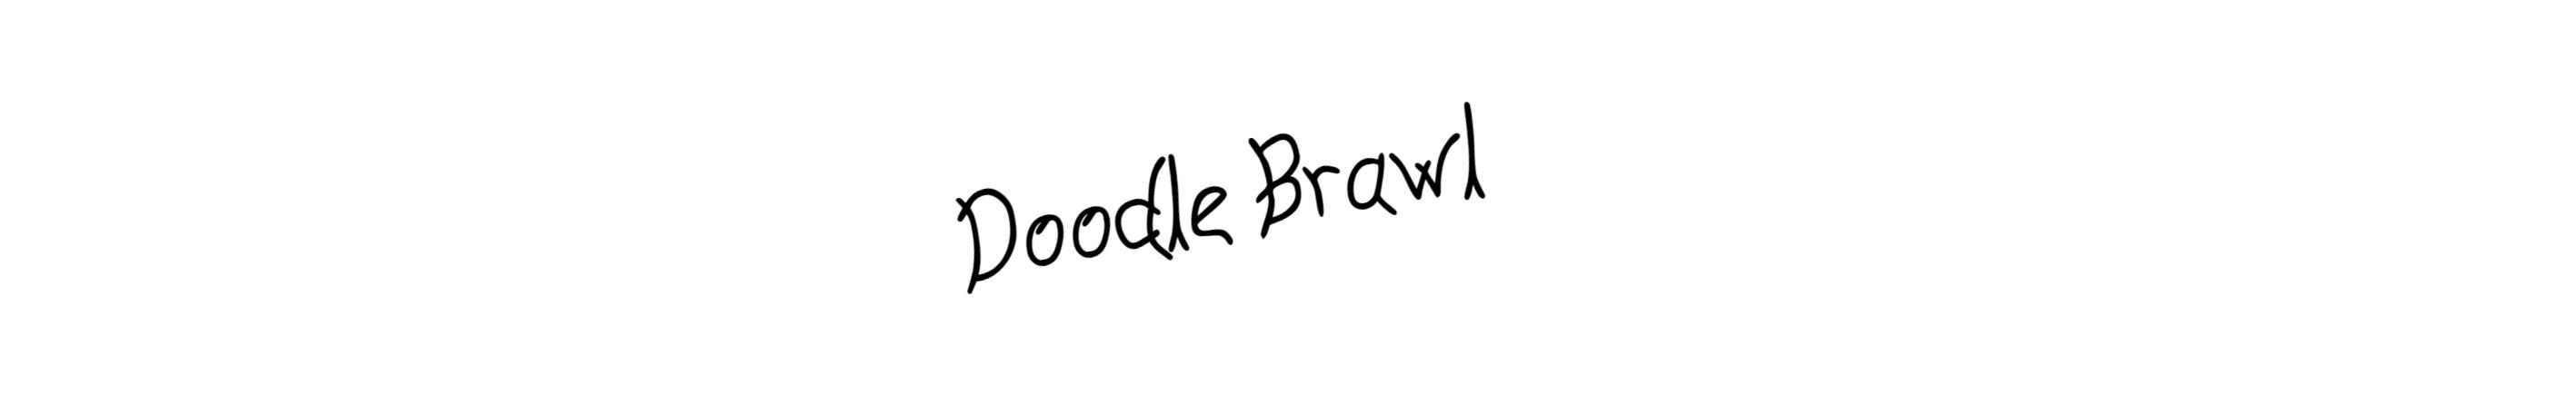 Doodle Brawl